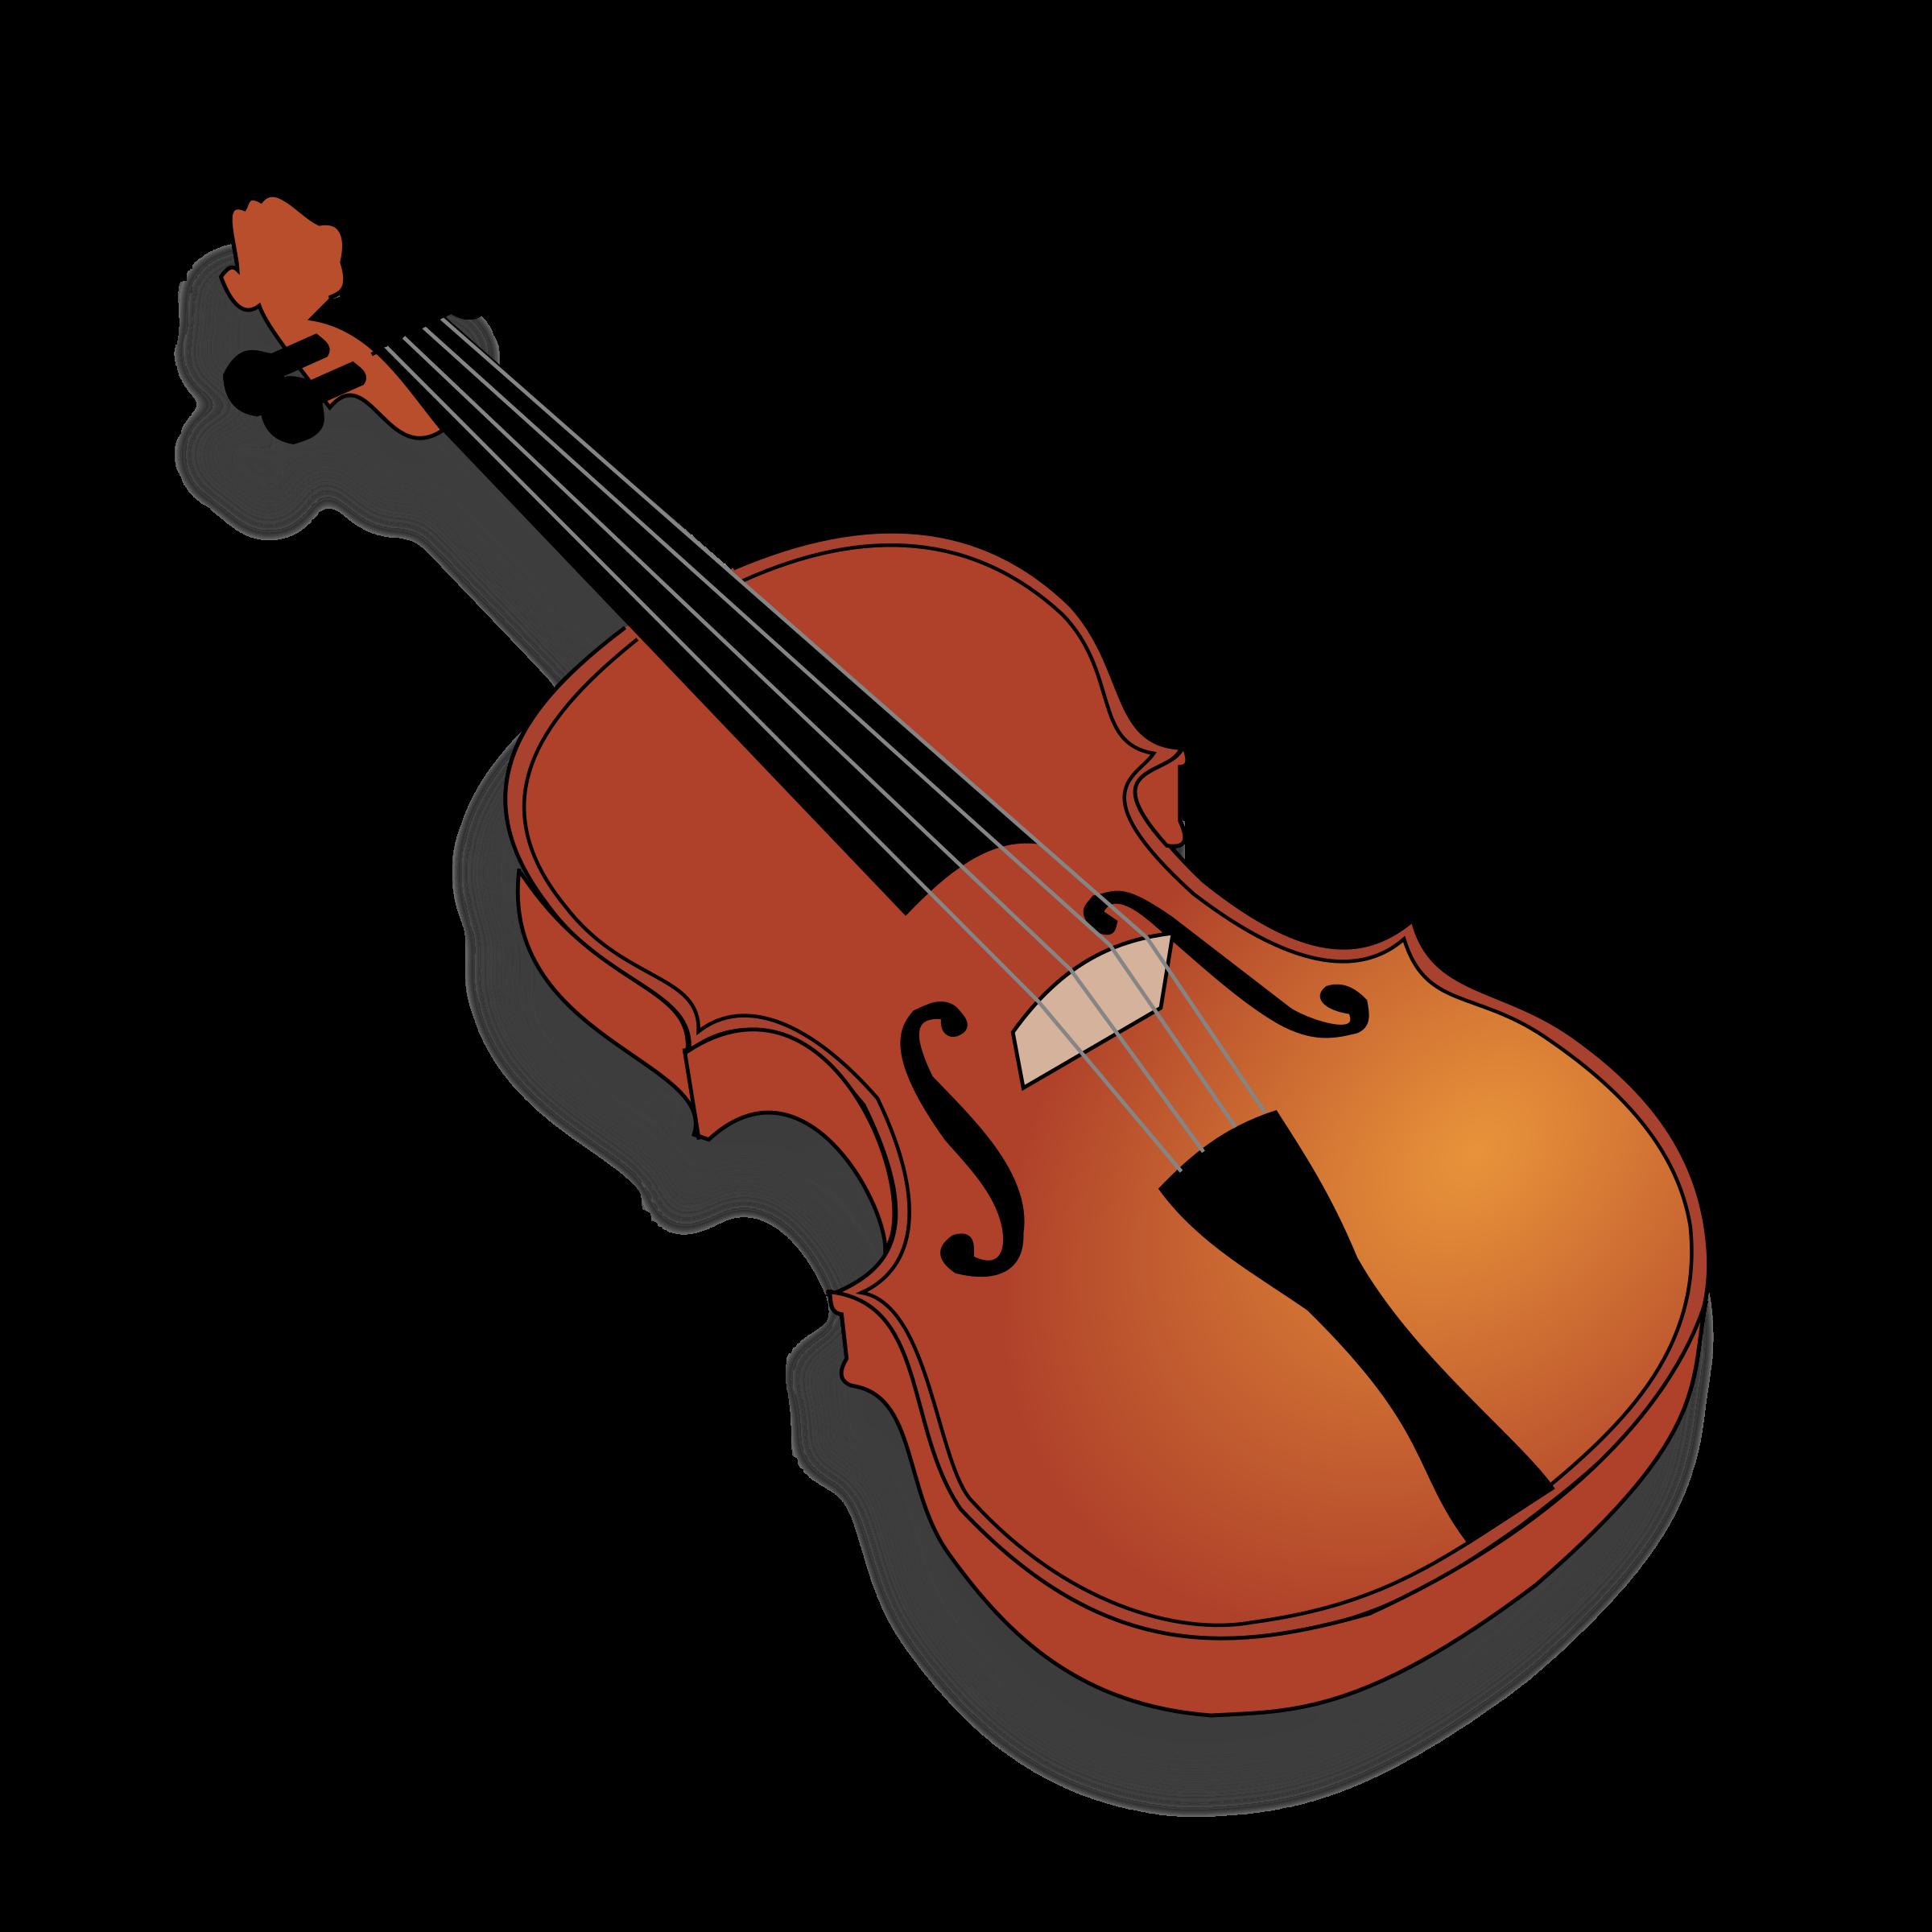 image . Violin clipart